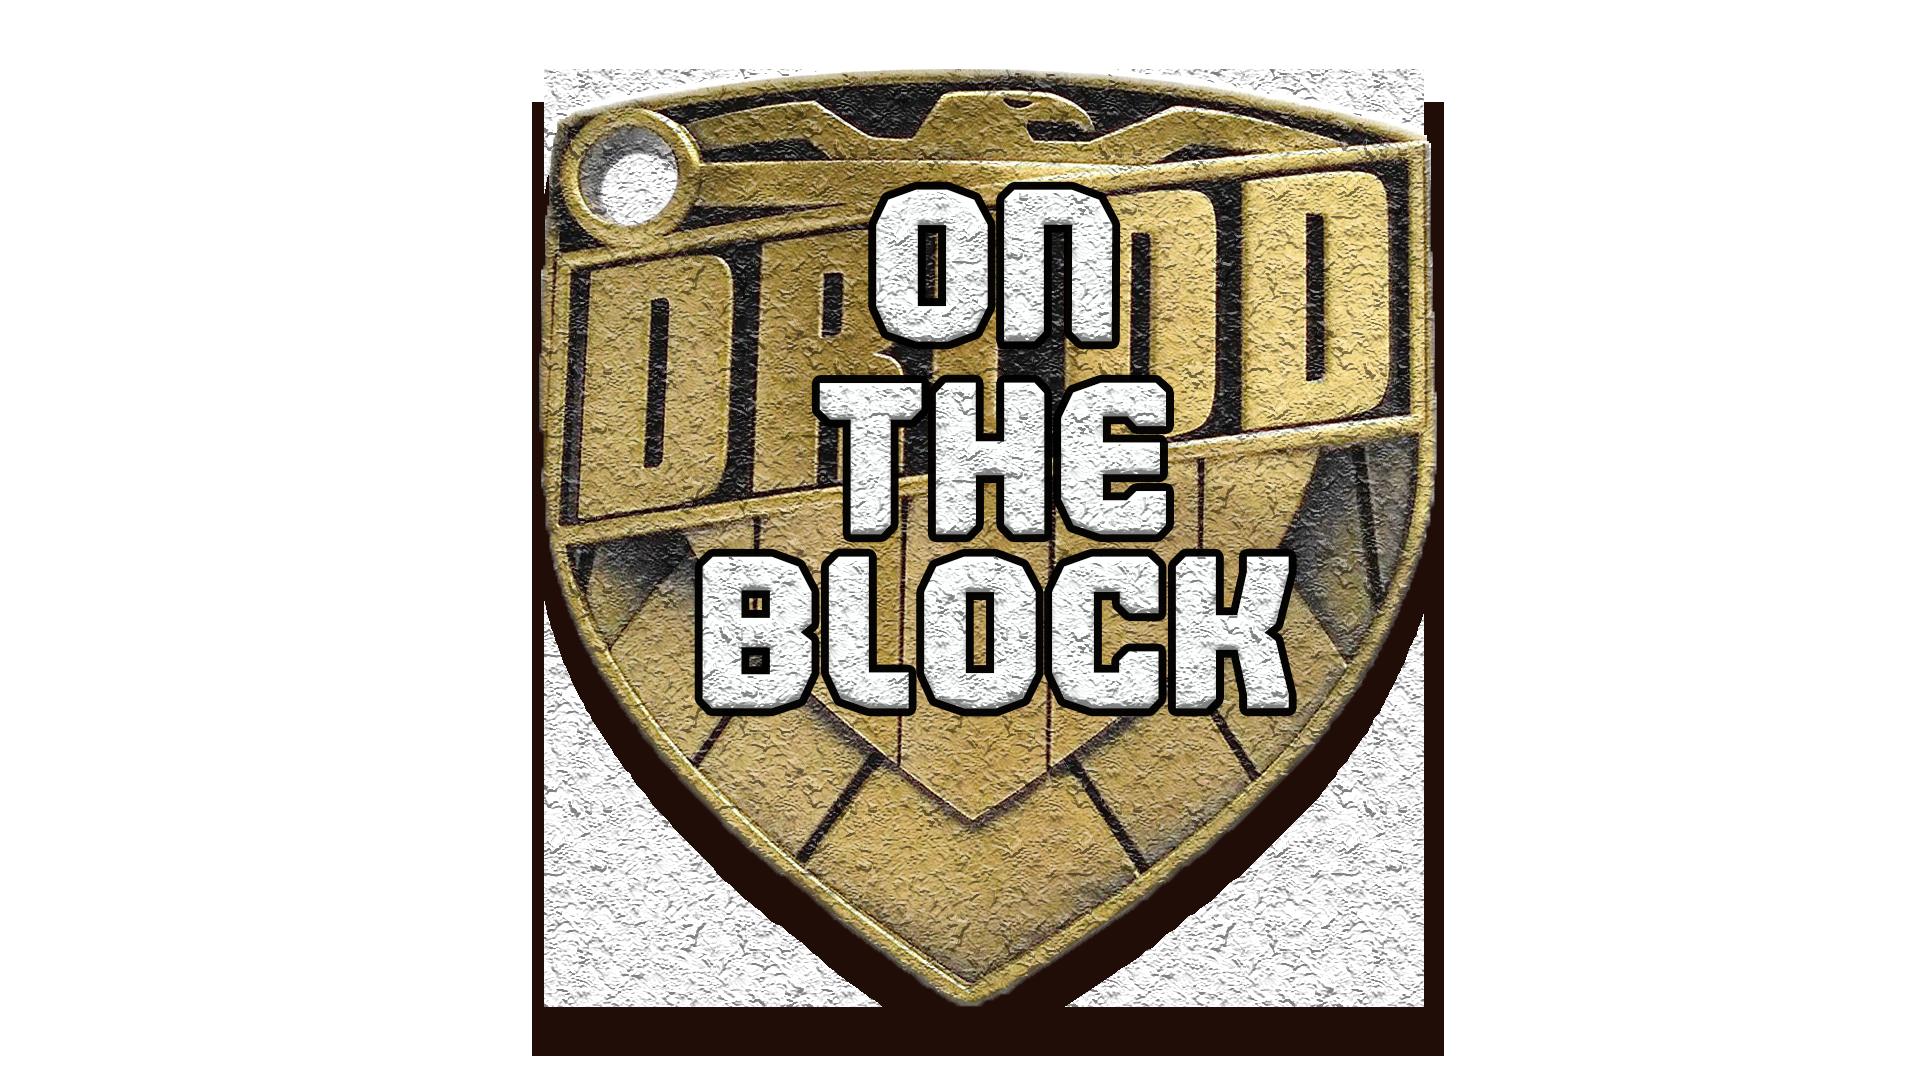 Episode 4 - Judge Dredd: On The Block show art